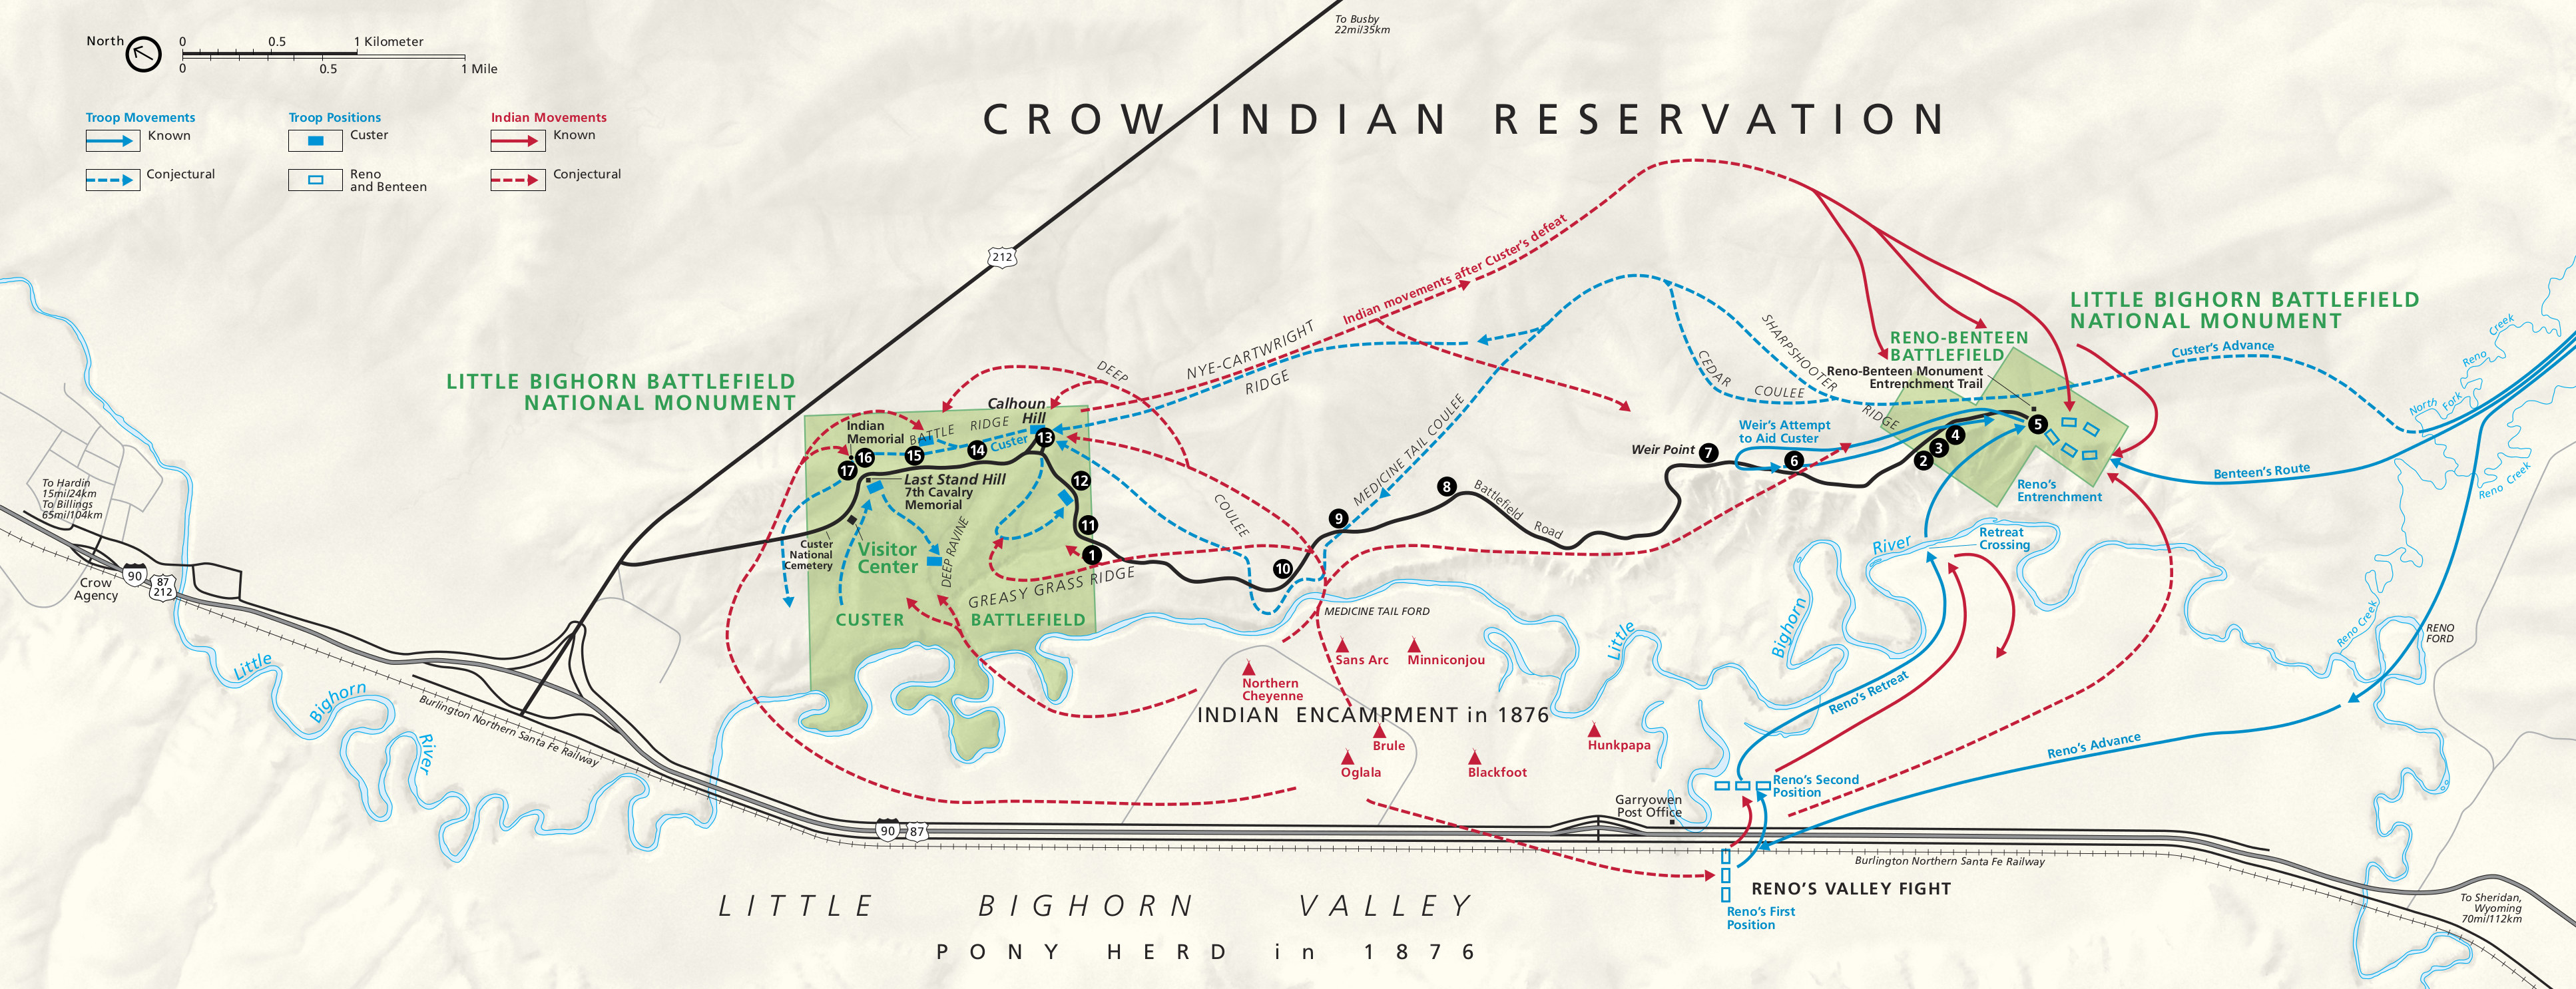 Little Bighorn Map Little Bighorn Maps | NPMaps.  just free maps, period.